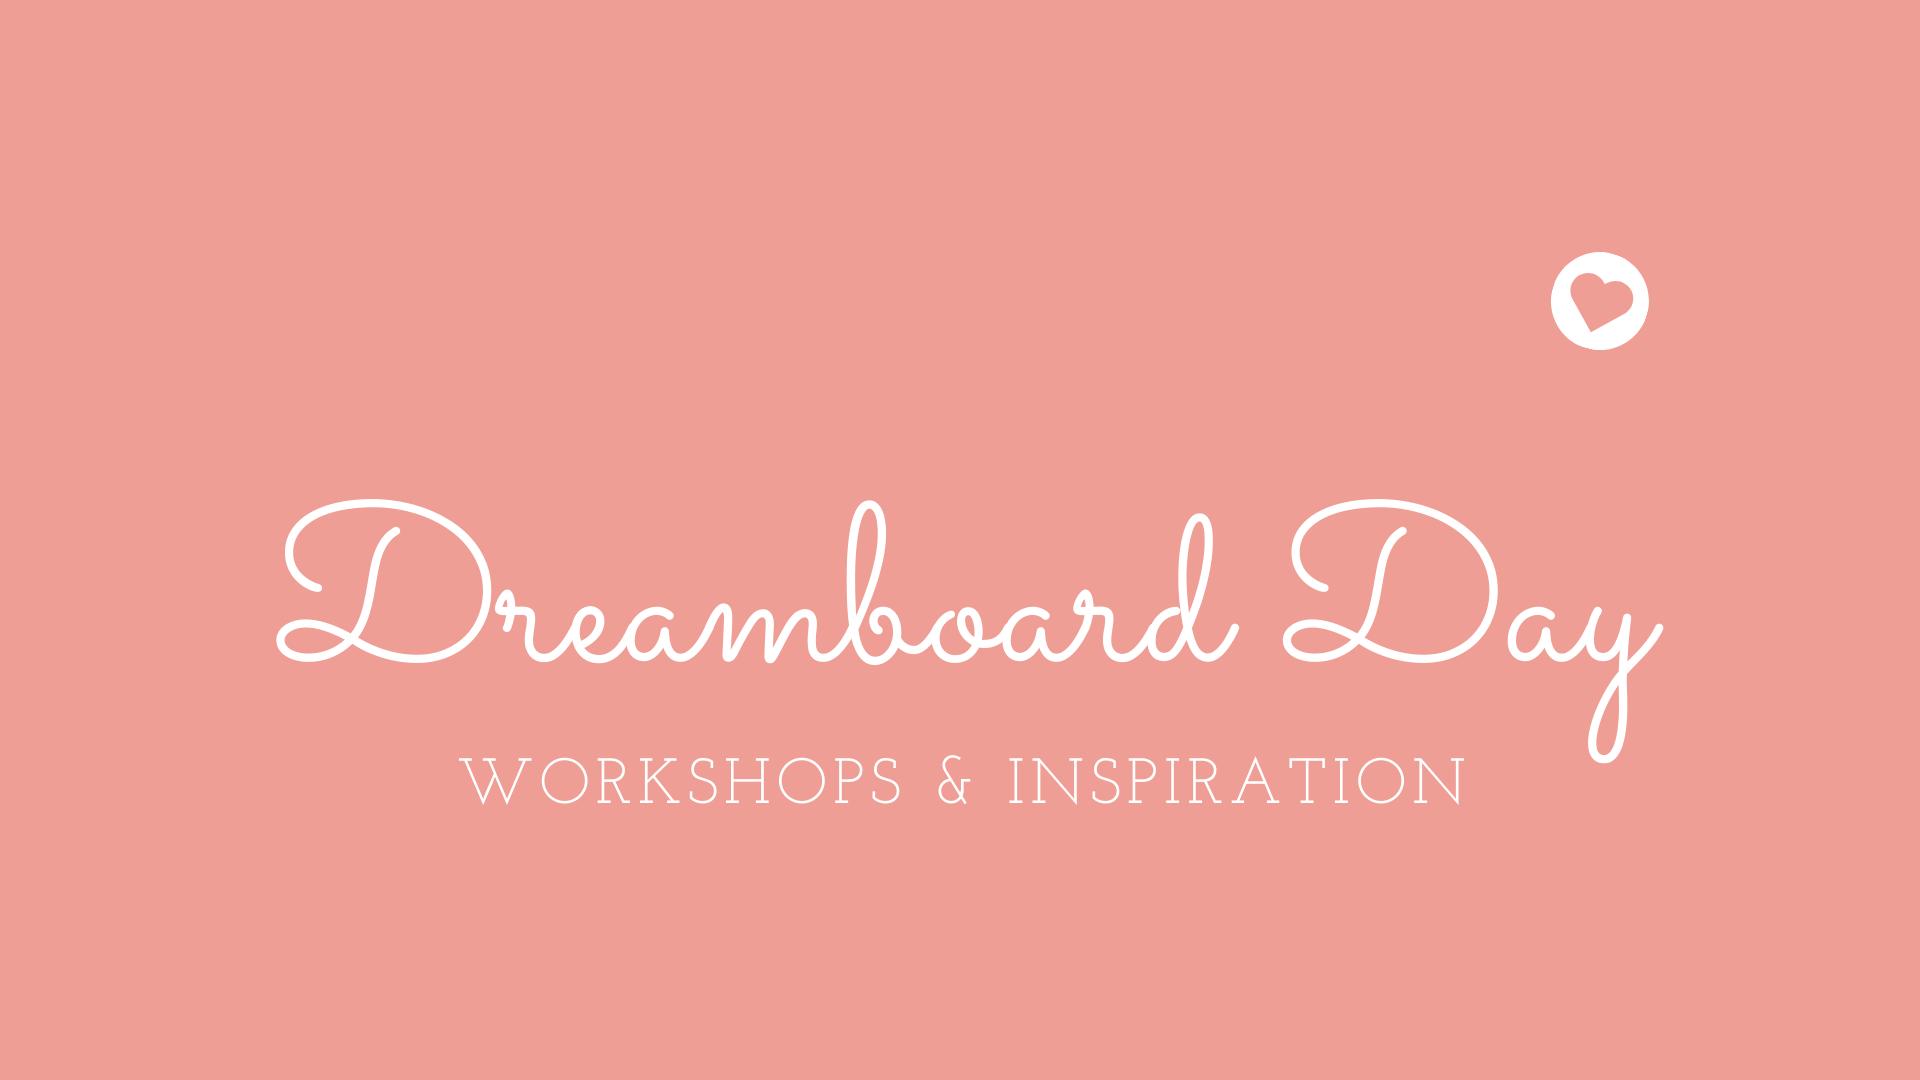 Dreamboard Day